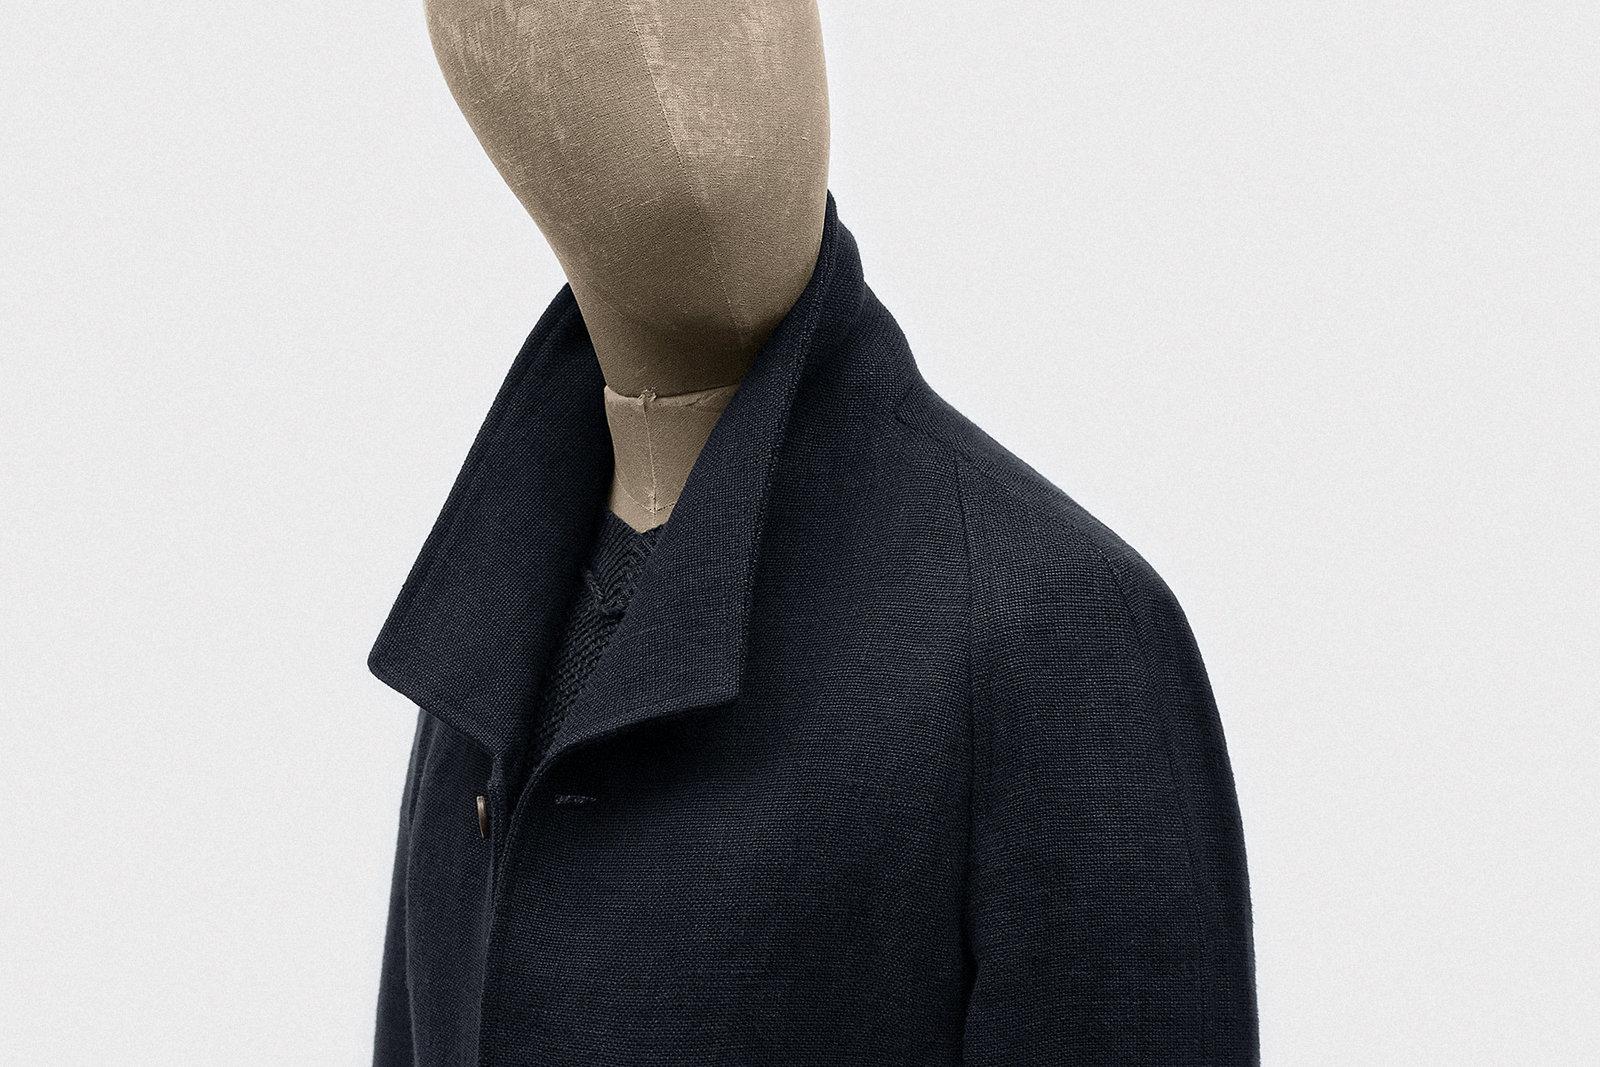 pyjama-top-linen-burlap-dark-navy-3@2x.jpg